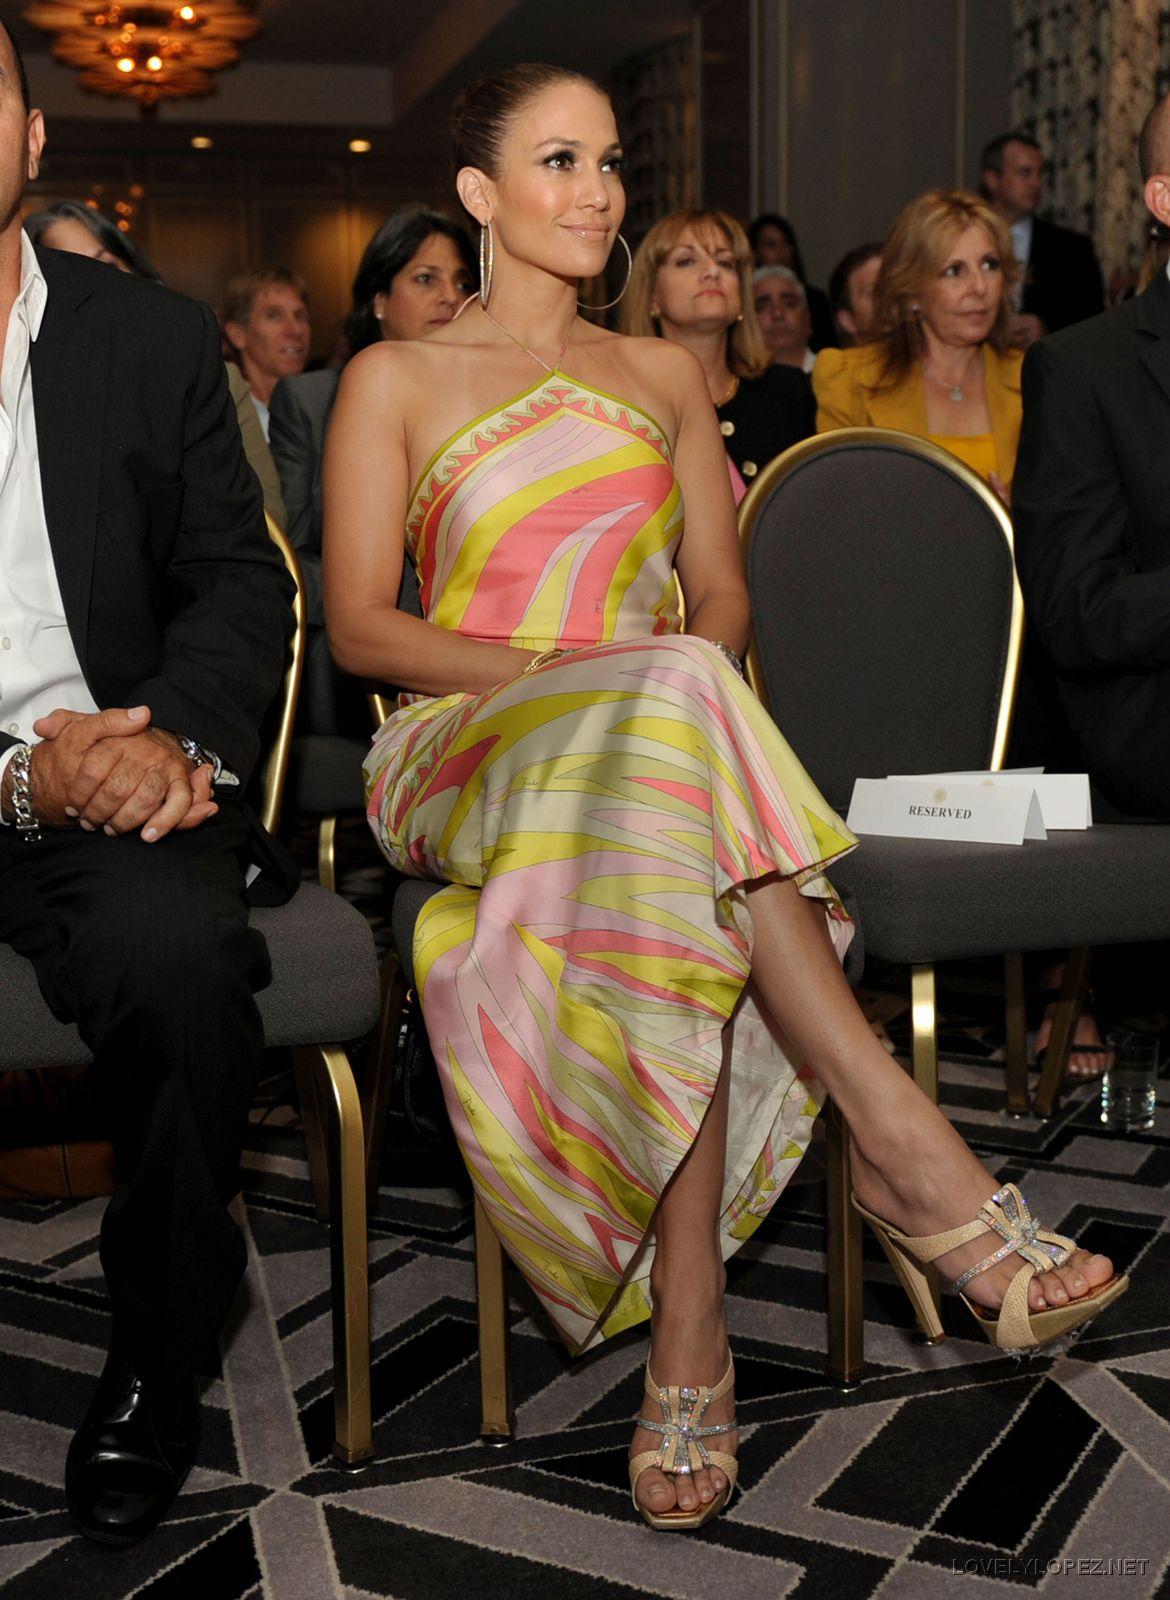 http://2.bp.blogspot.com/-sT6Lbd_LMZ8/Ti1_mMjhucI/AAAAAAAABl4/1Xlg-IeL6Ys/s1600/Jennifer-Lopez-Feet-183443.jpg